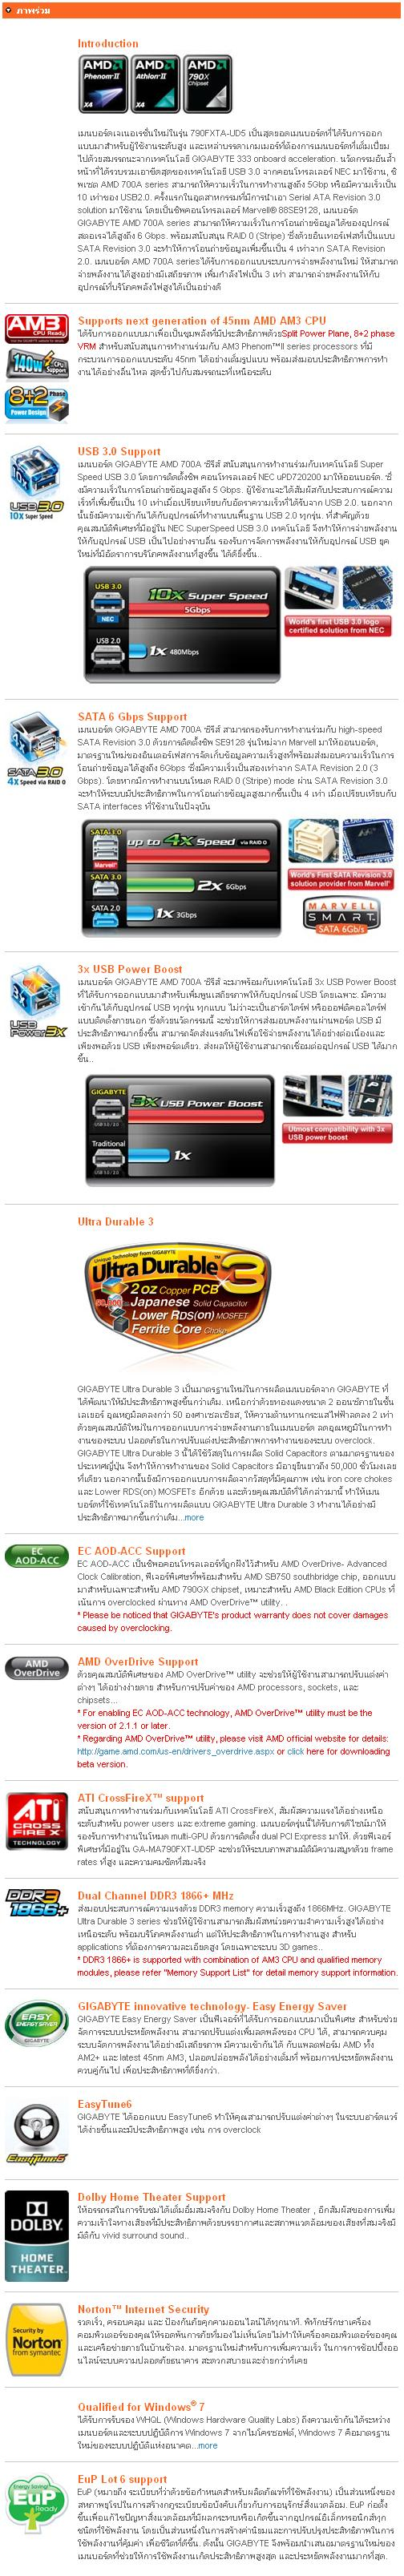 gig GIGABYTE 790XTA UD4 Motherboard Review